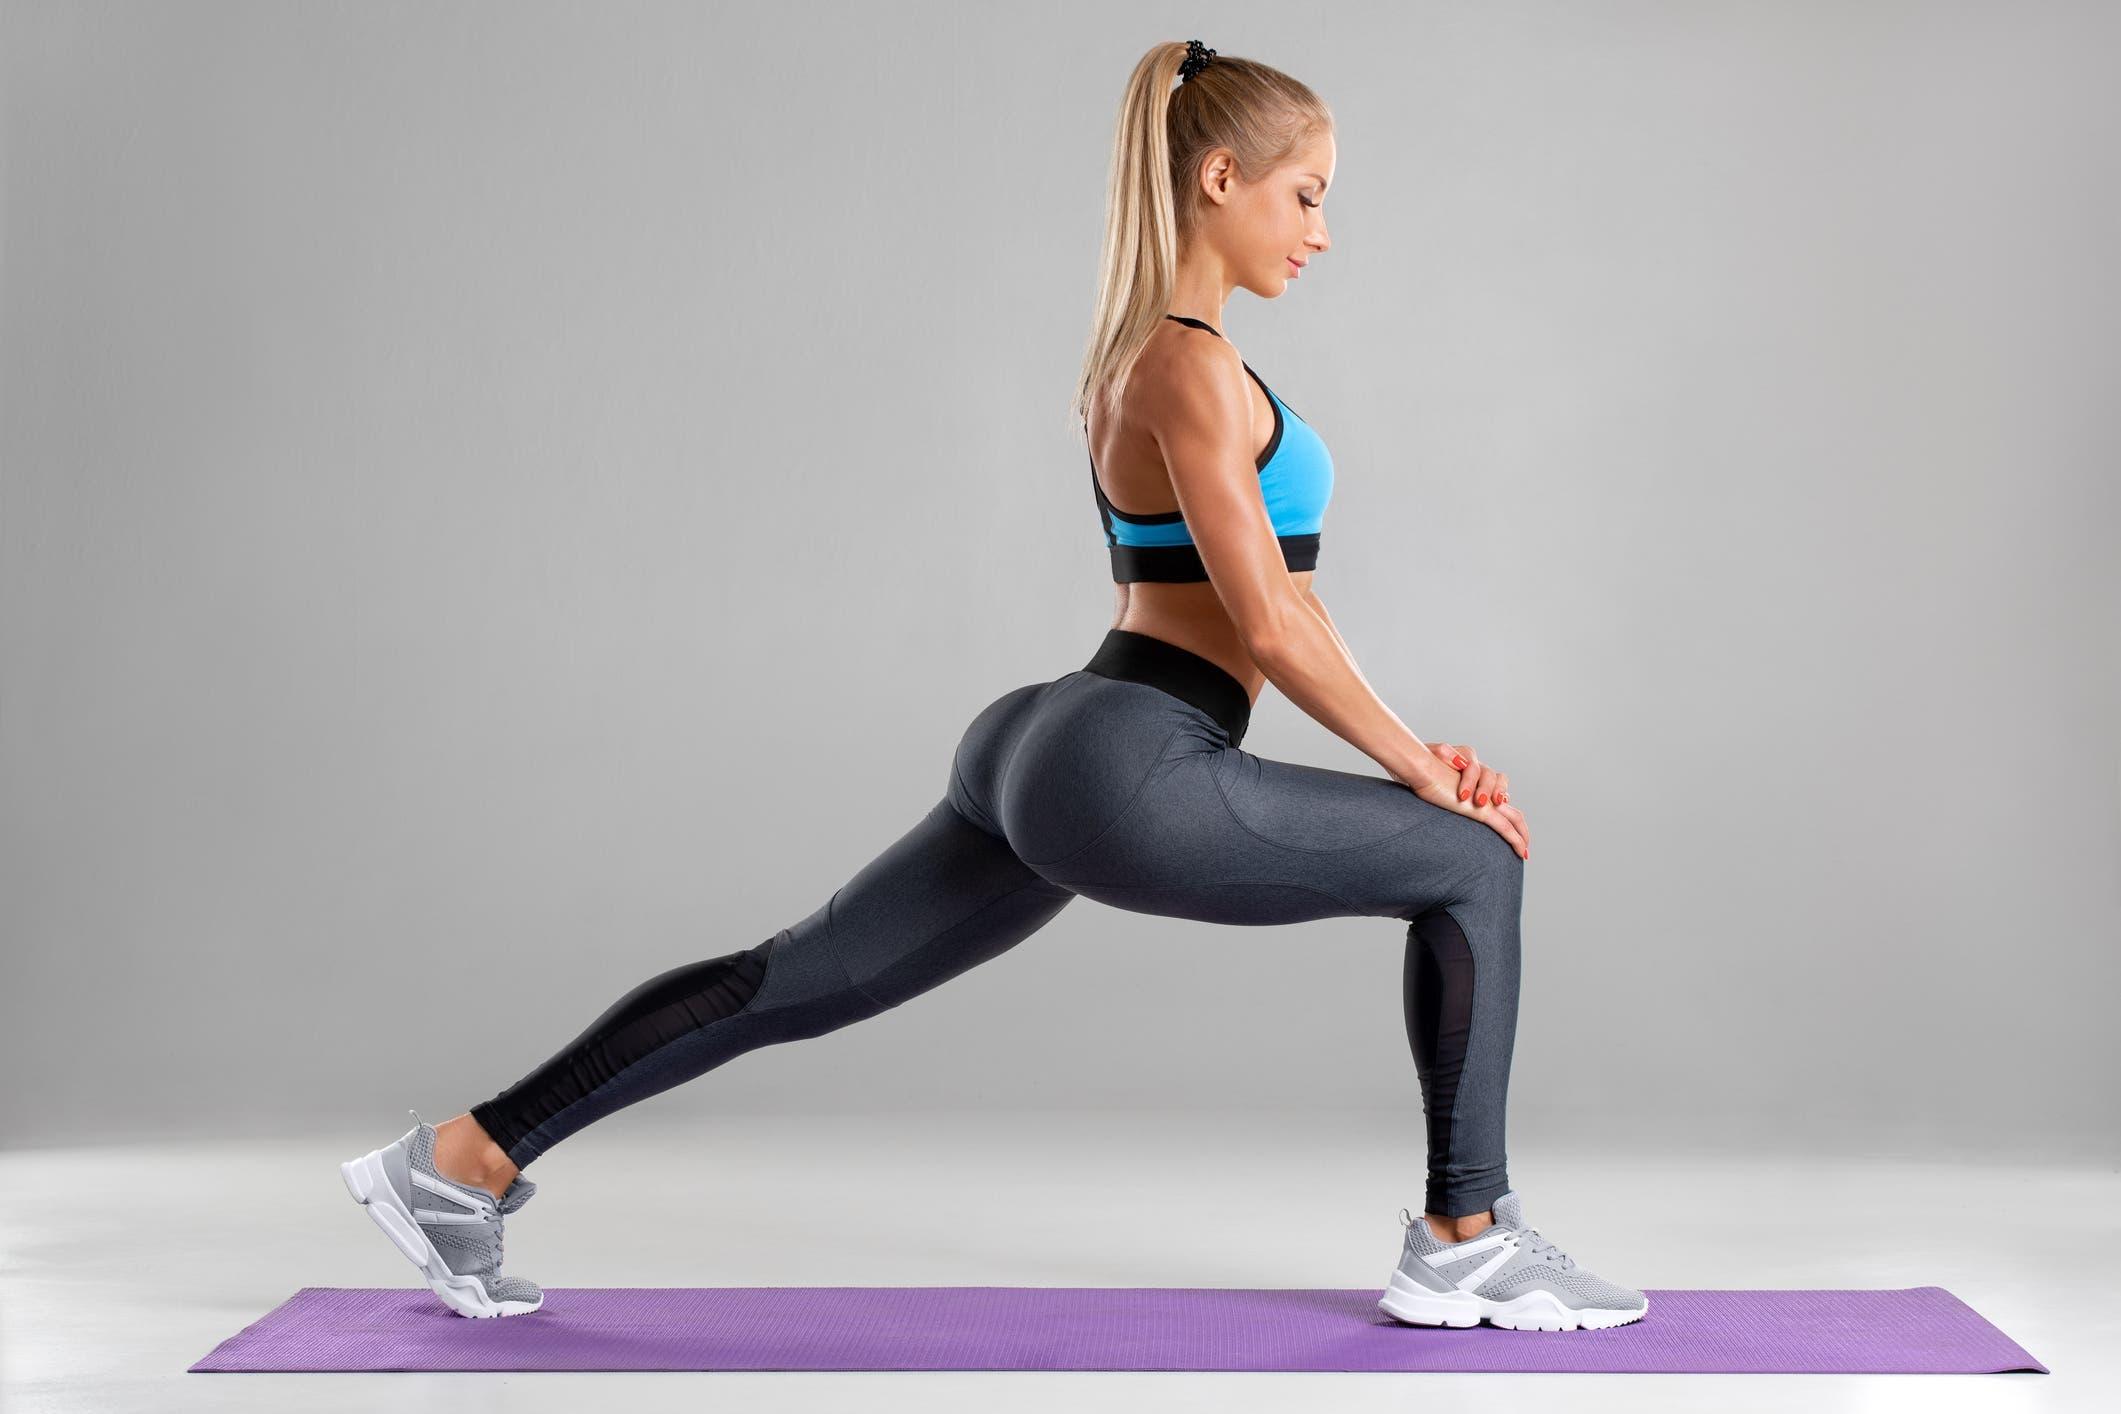 exercice fente avant